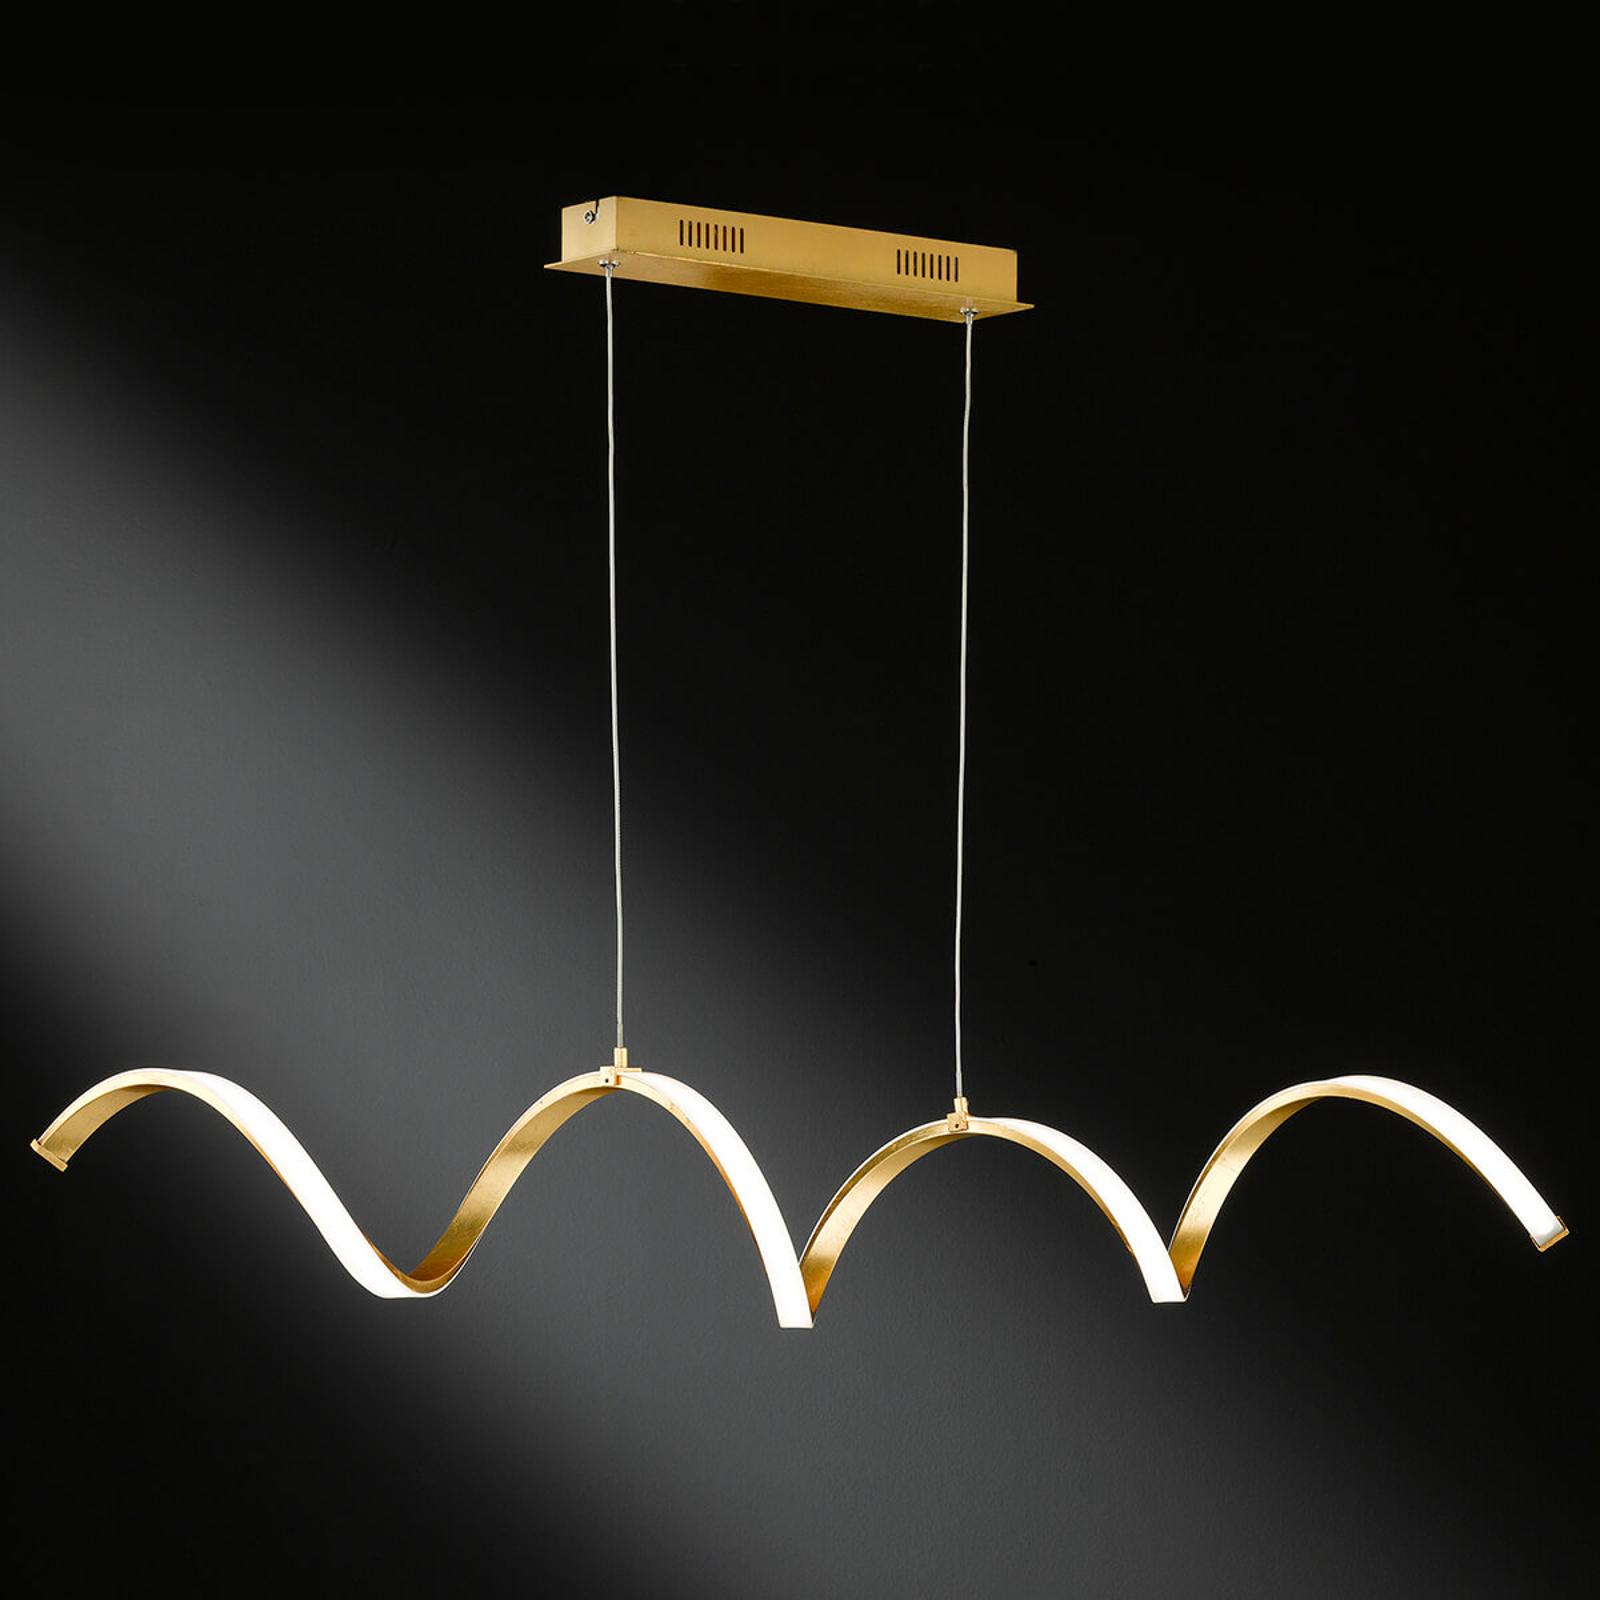 Russell - ekstrawagancka lampa wisząca LED, złota